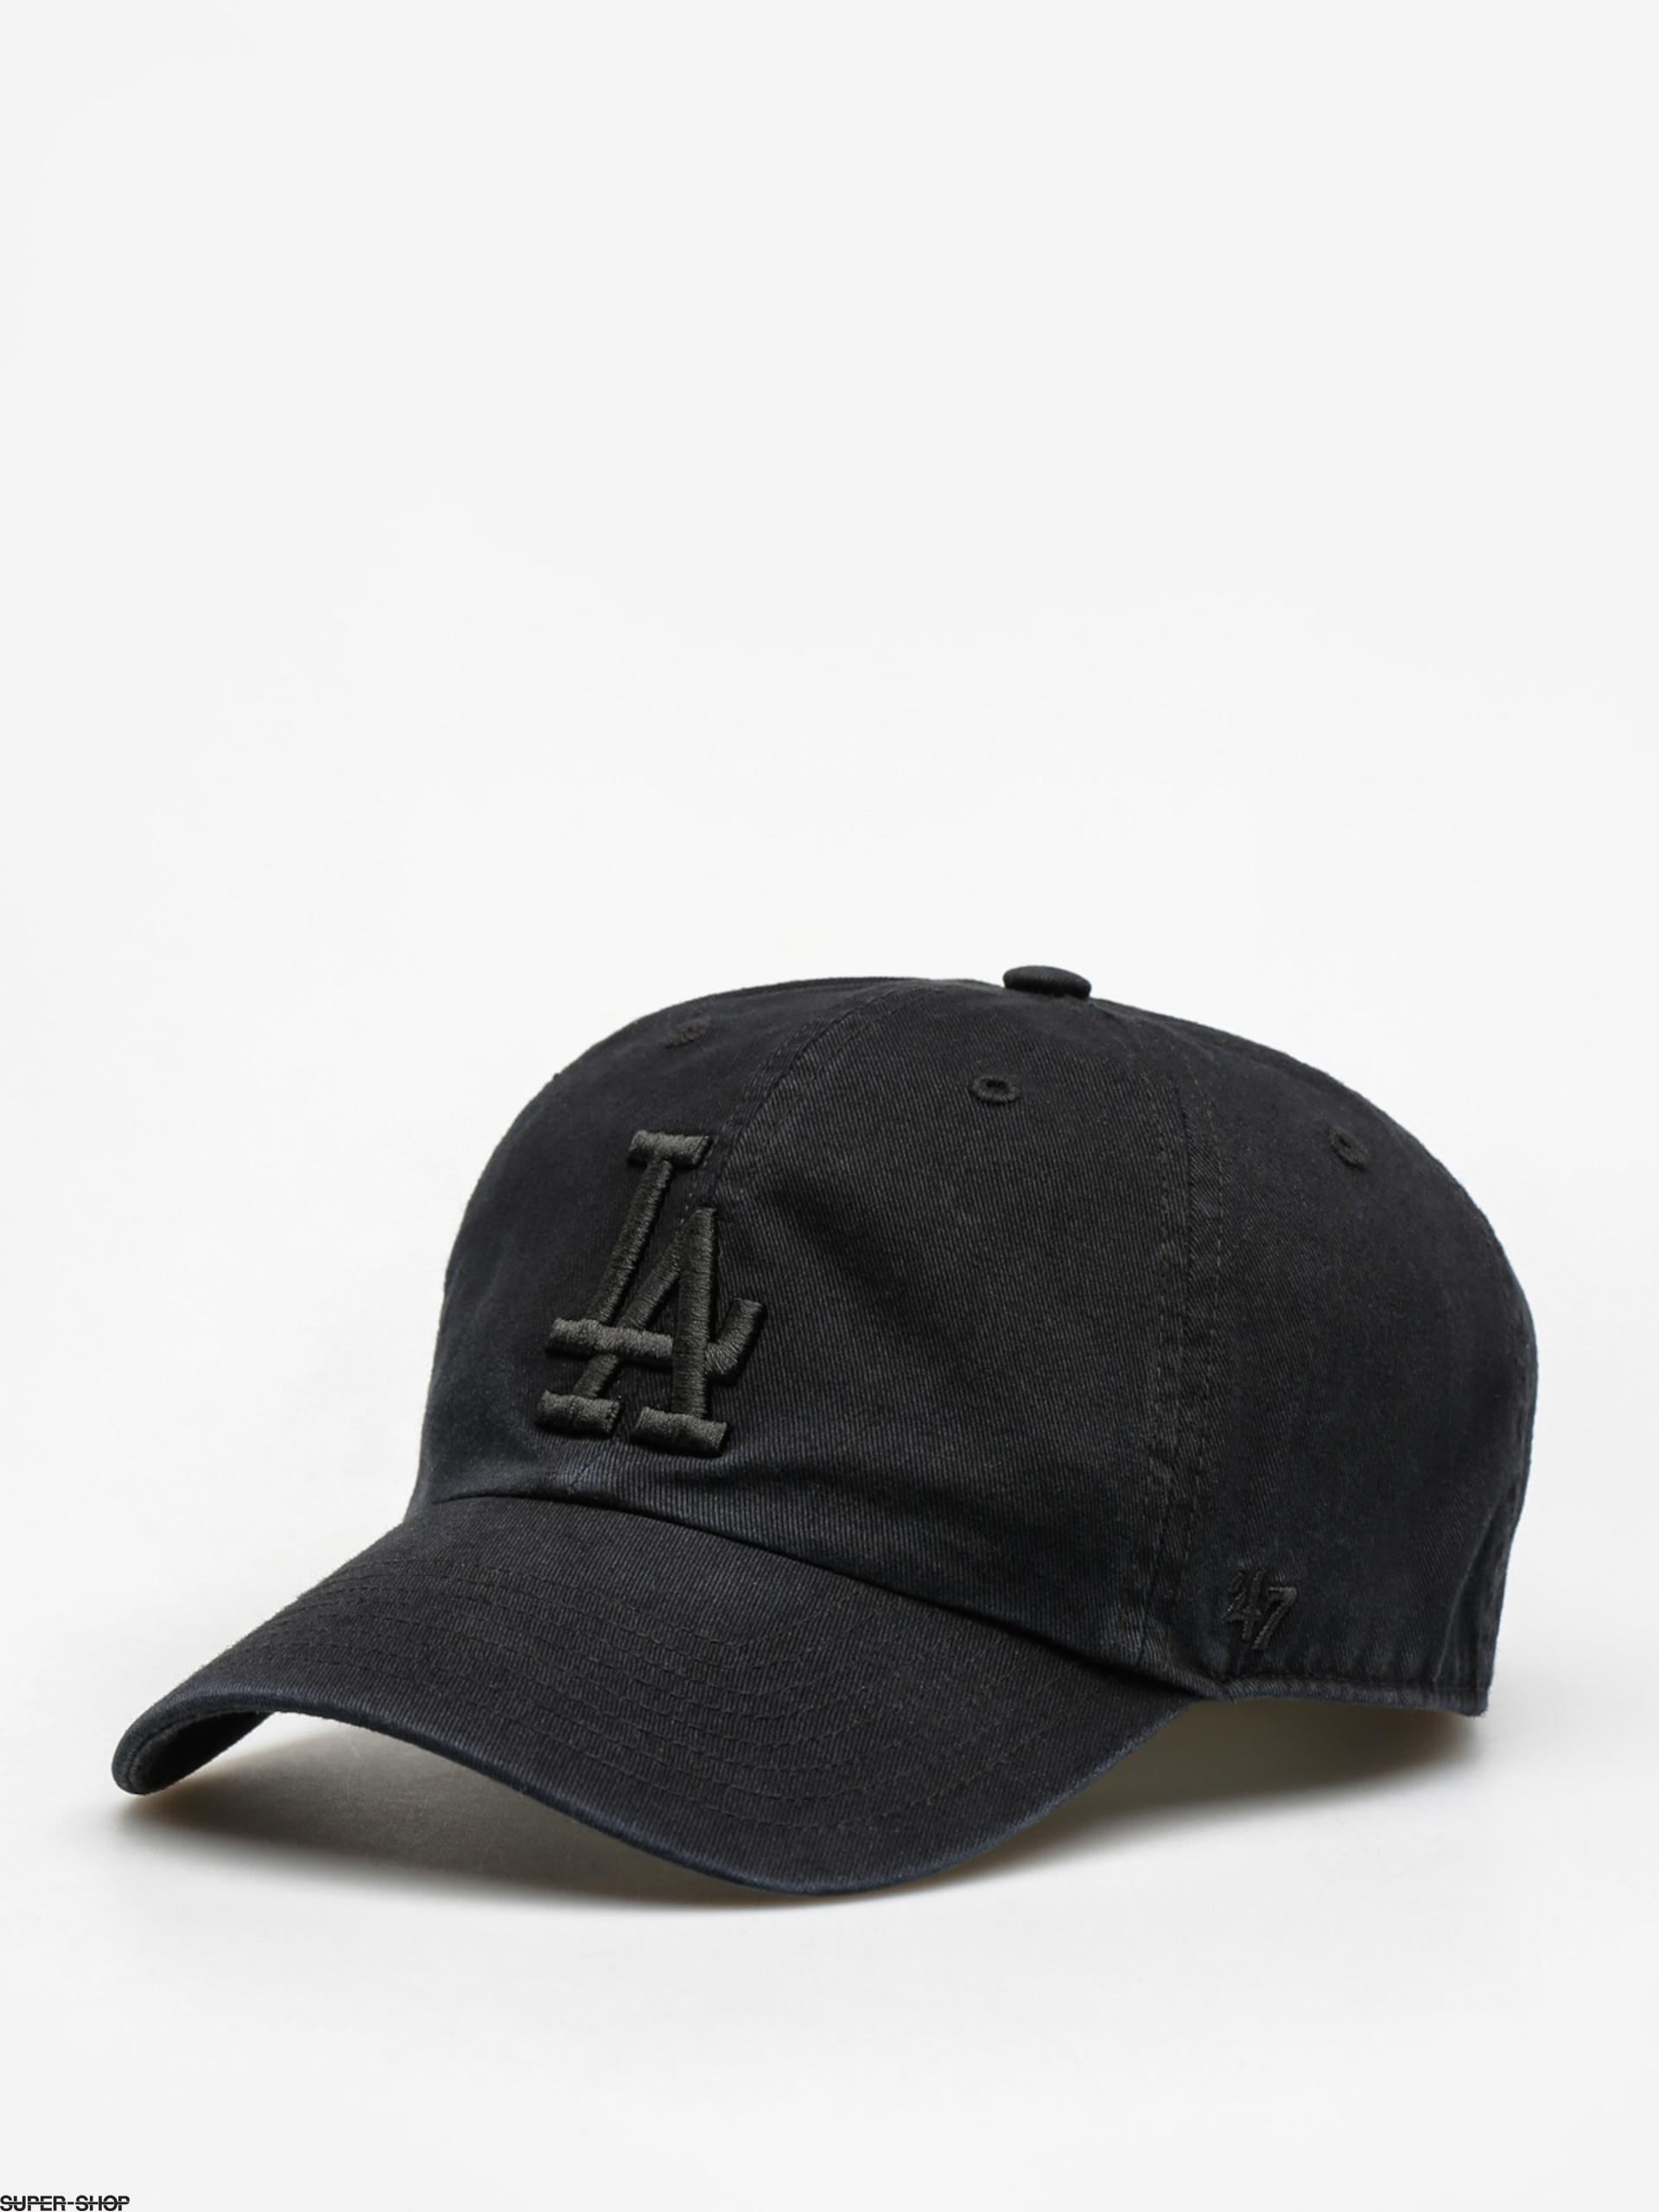 ddc05de303108 869791-w1920-47-brand-cap-los-angeles-dodgers-black.jpg